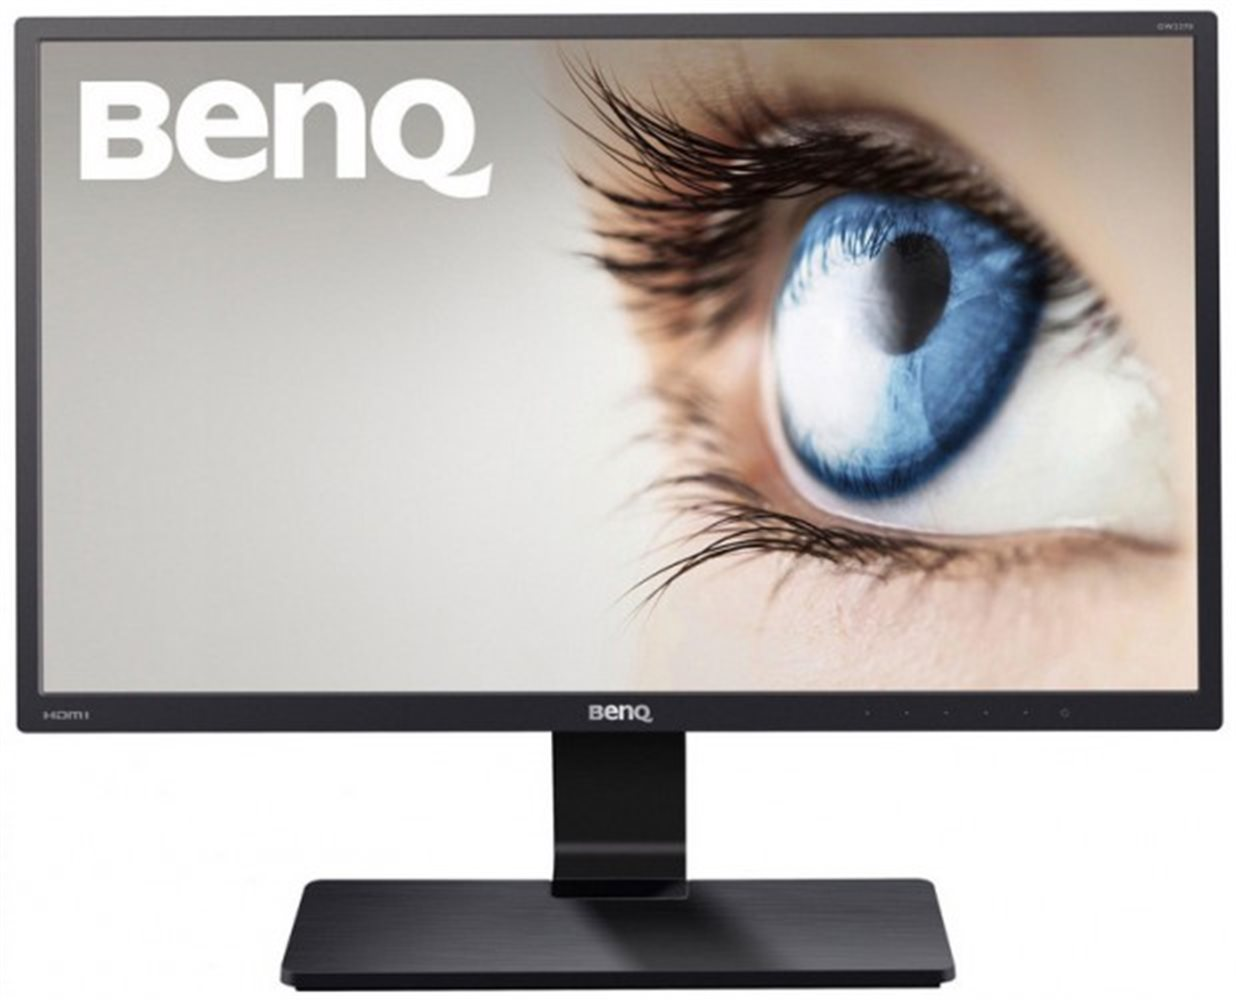 "BenQ LCD GL2580HM Black 24,5""W/TN LED/FHD/12M:1/2ms/DVI/HDMI/repro/Flicker-free/Low Blue Light"